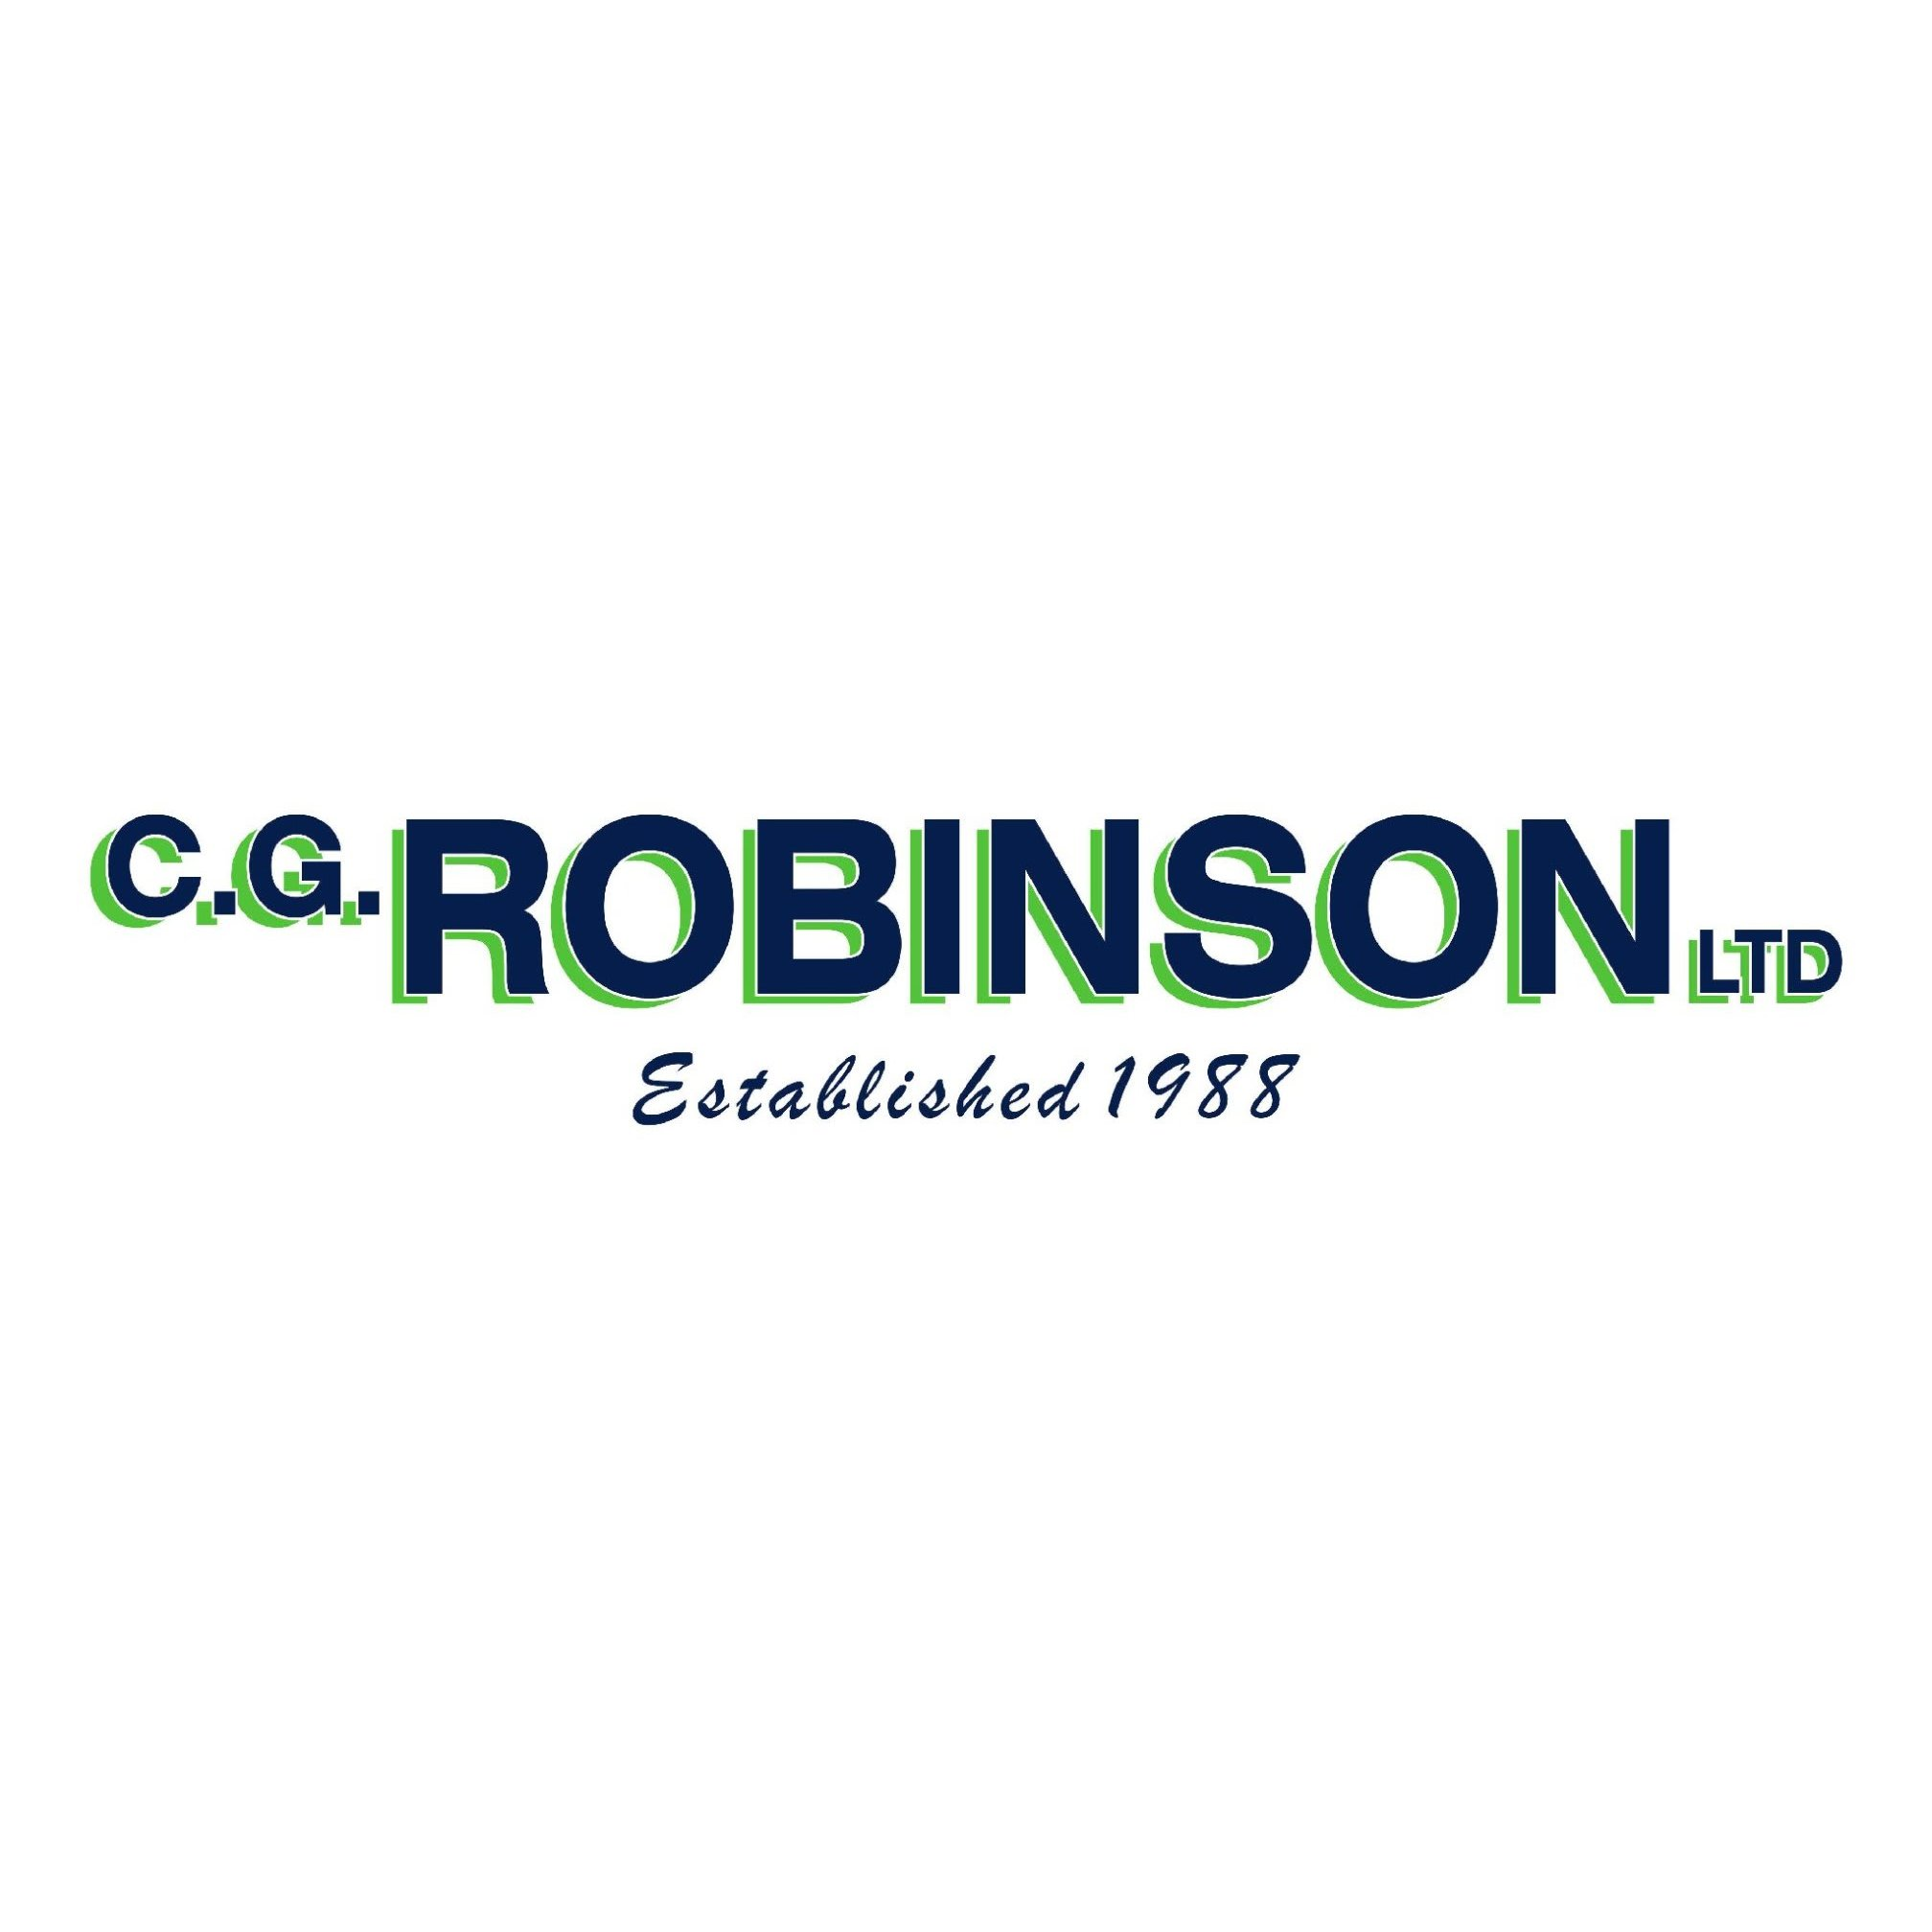 C G Robinson Ltd - Stockton-On-Tees, North Yorkshire TS21 1BT - 01642 588806 | ShowMeLocal.com